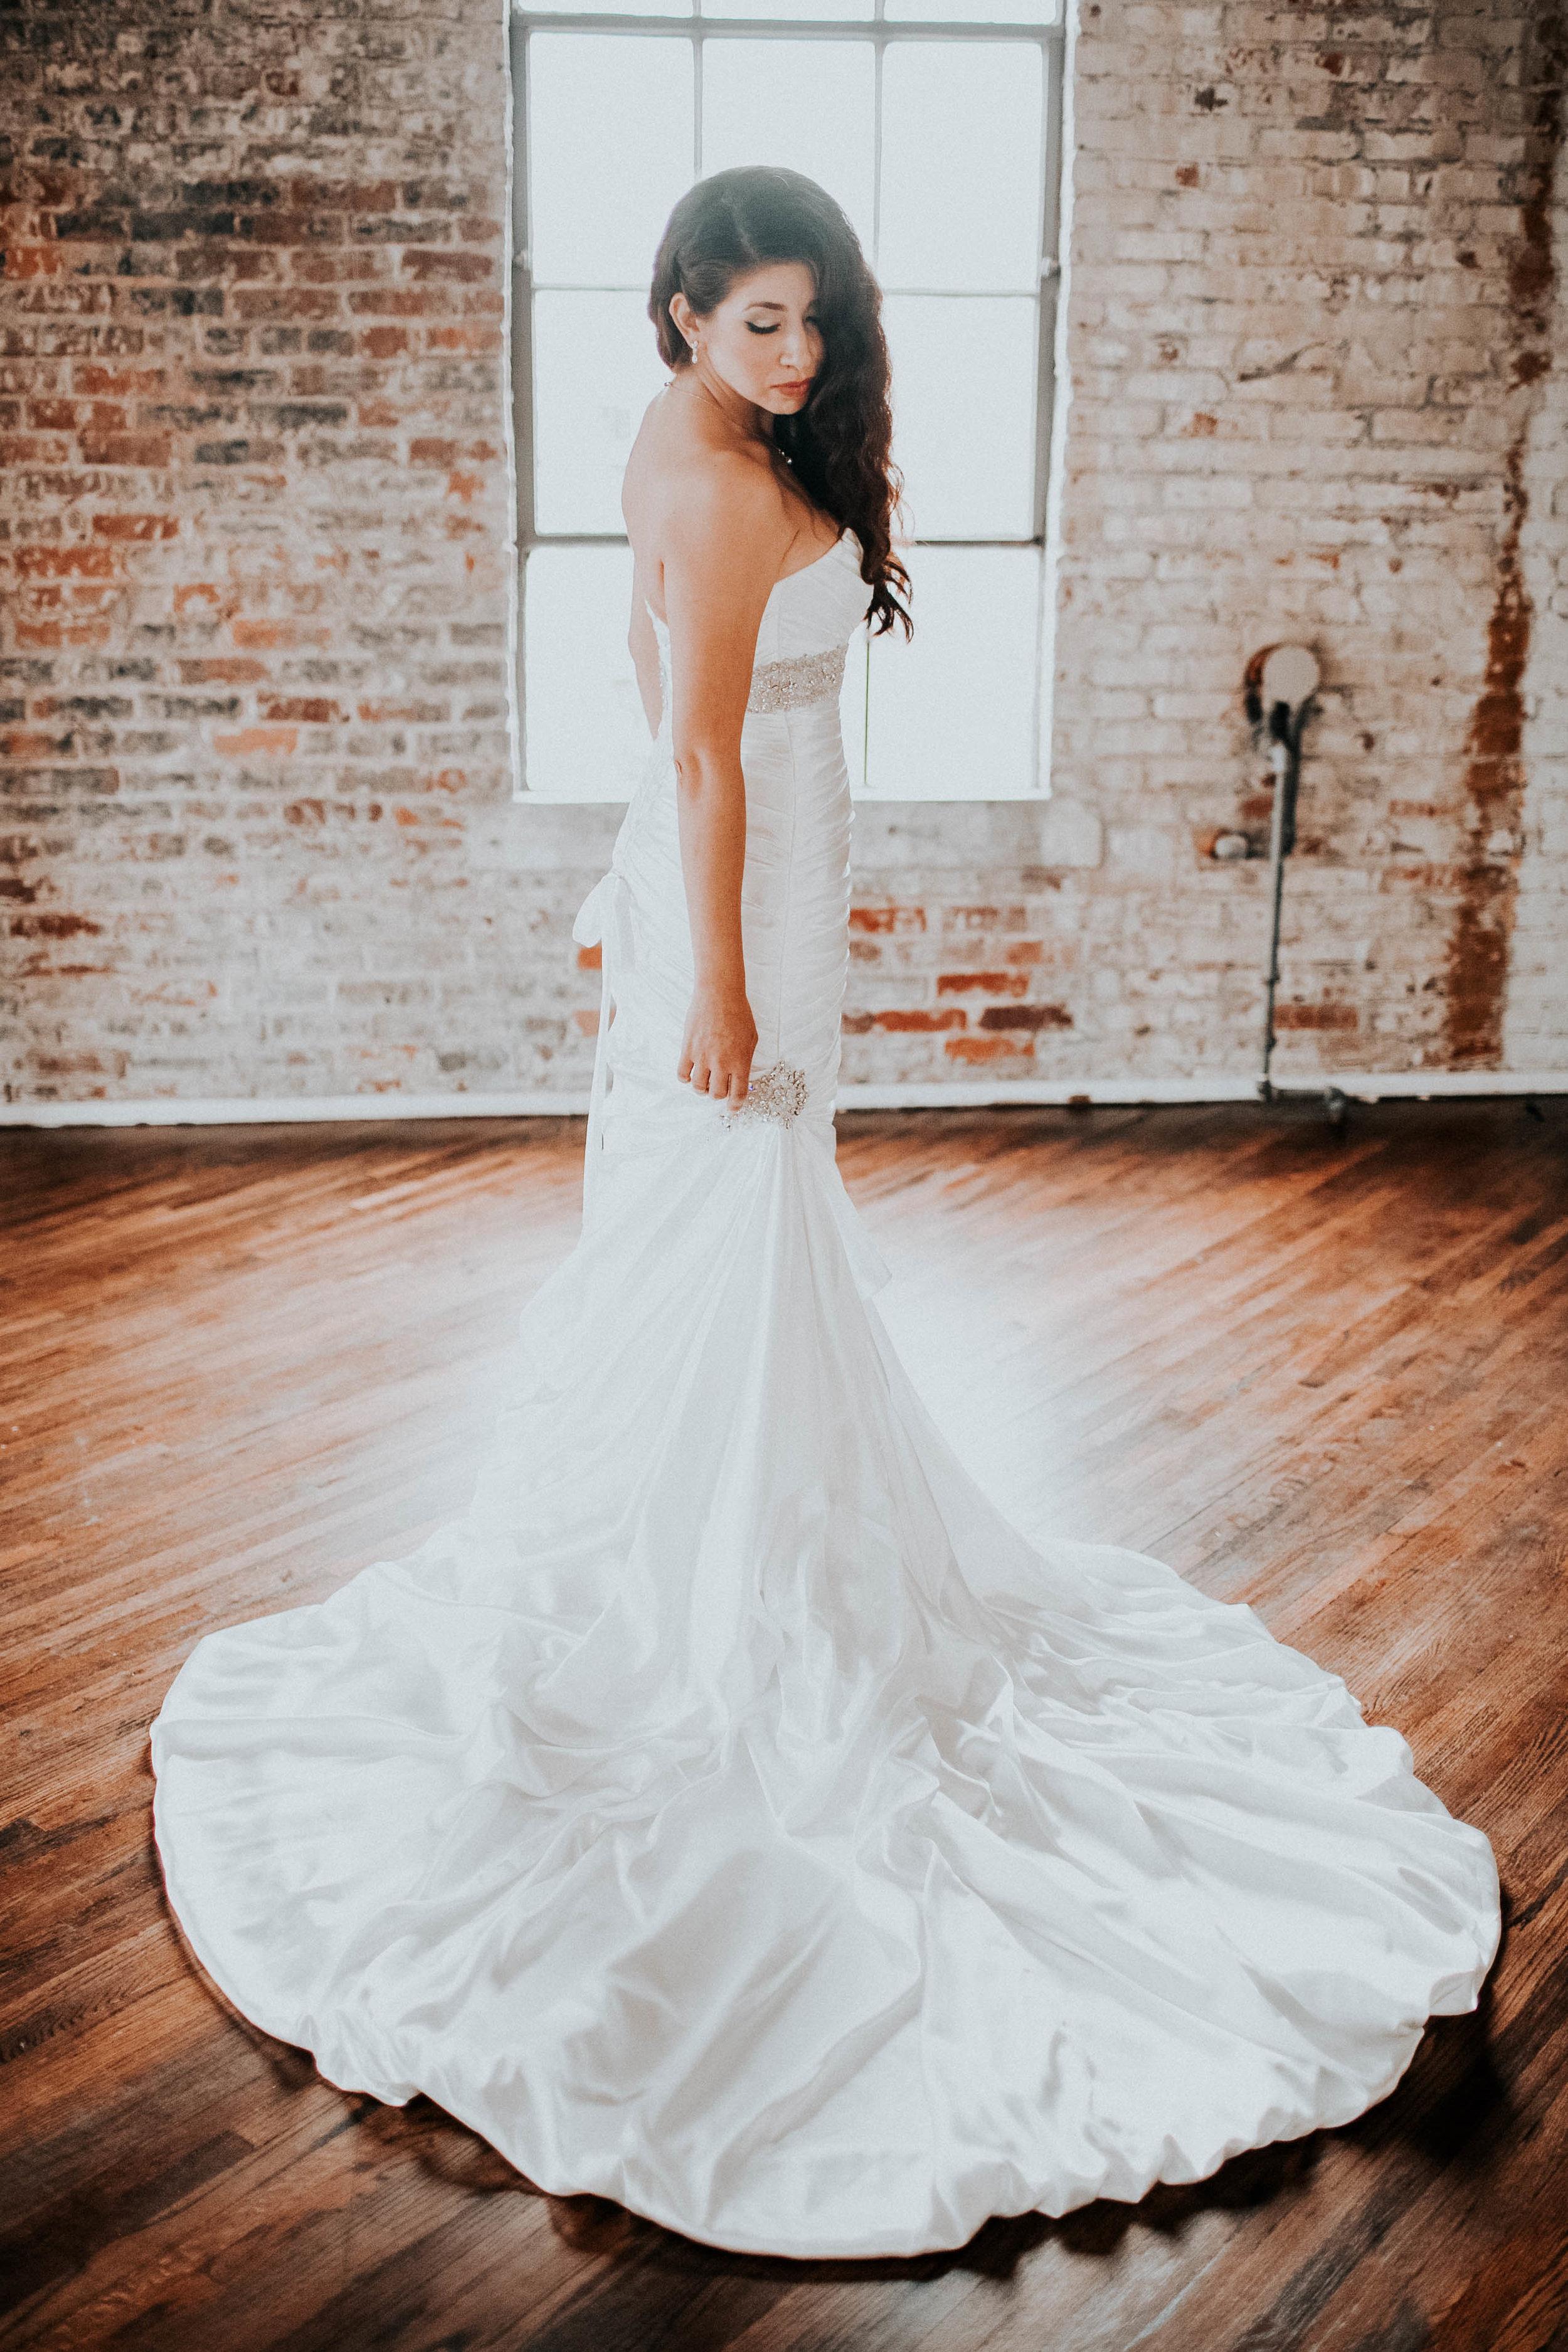 Houston Texas Engagment and Wedding Photographer-0104.jpg